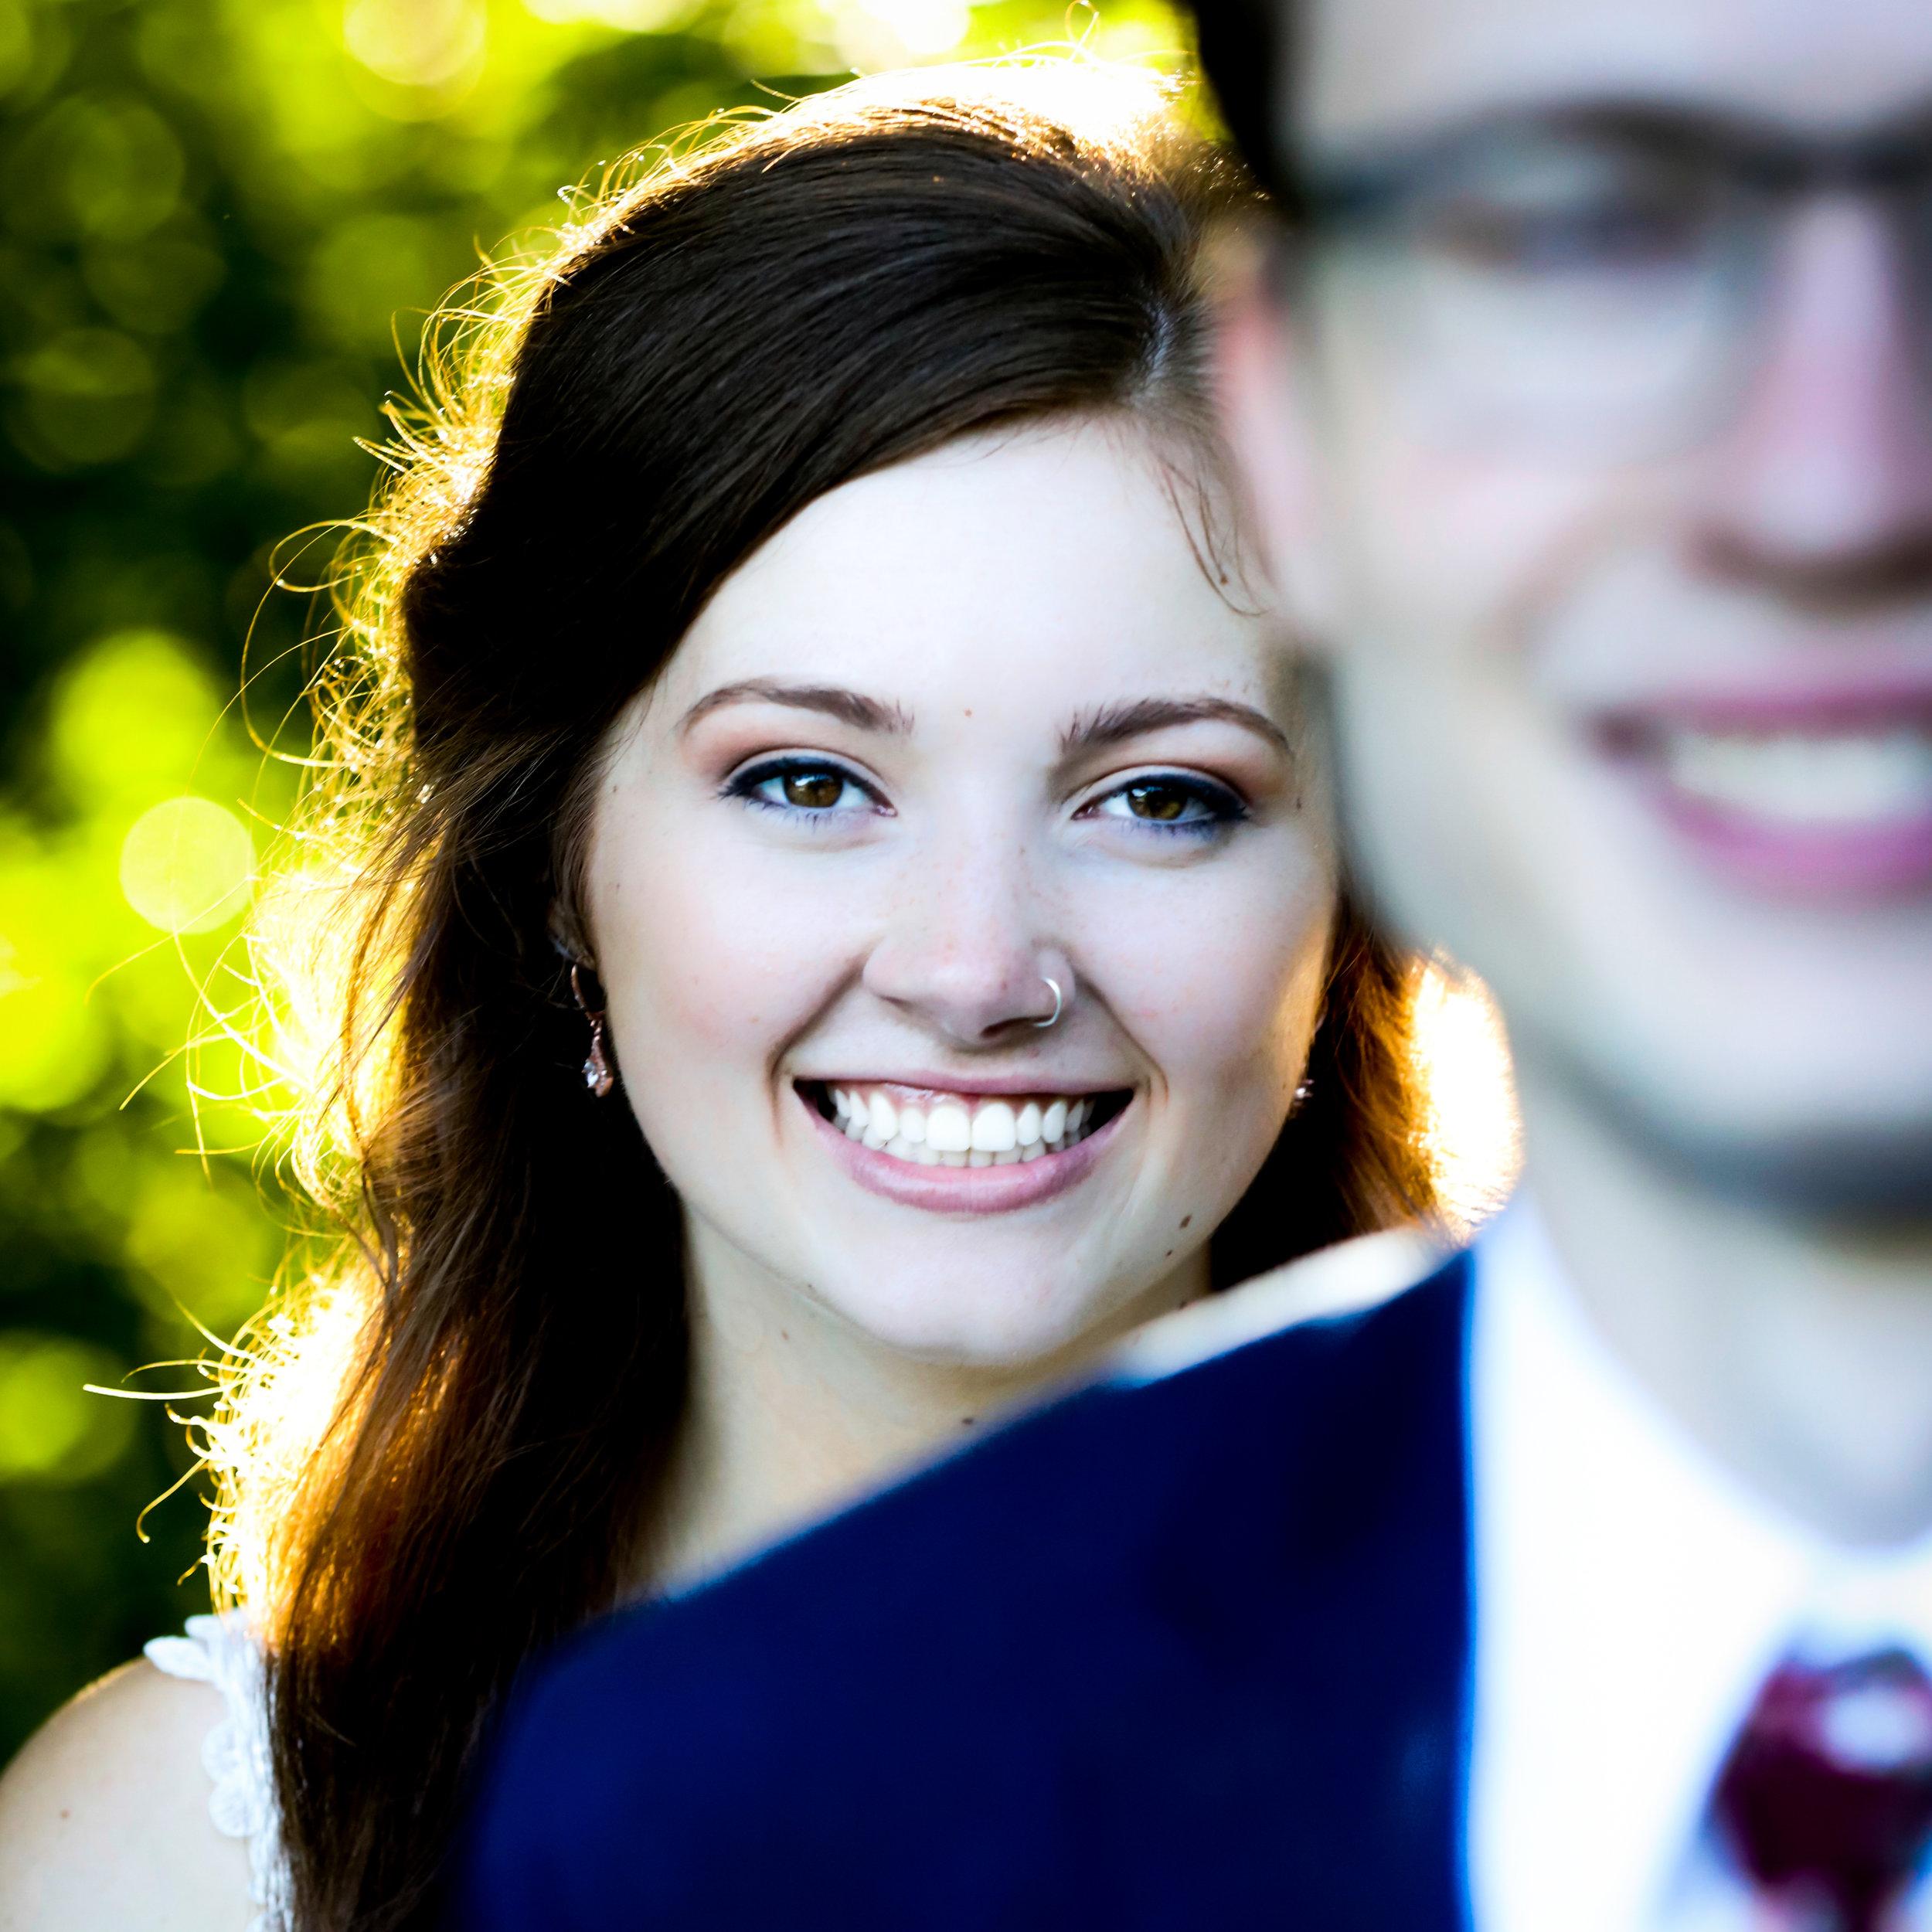 WeddingWebsite-40.jpg